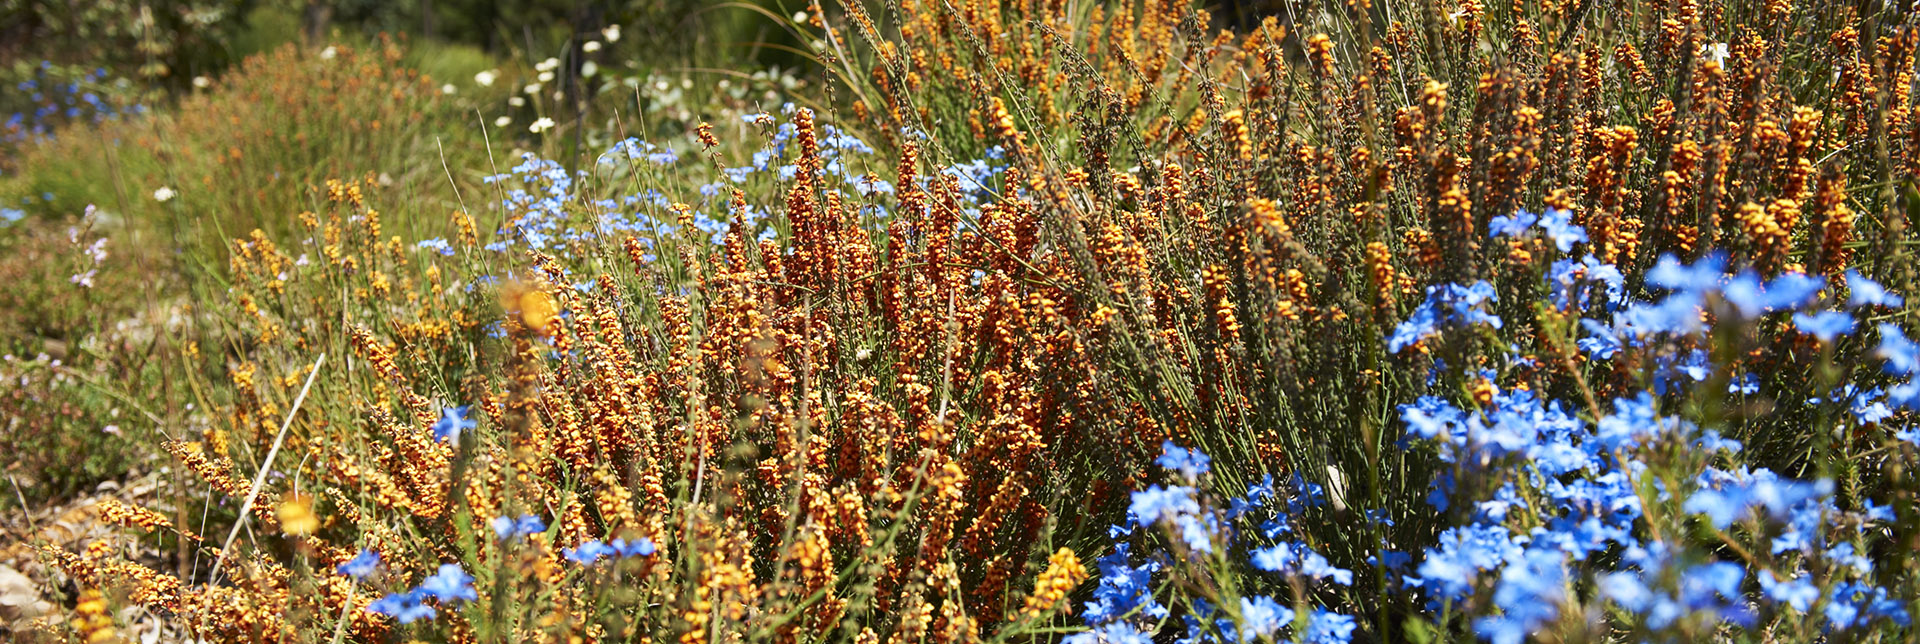 Western Australian spring wildflowers